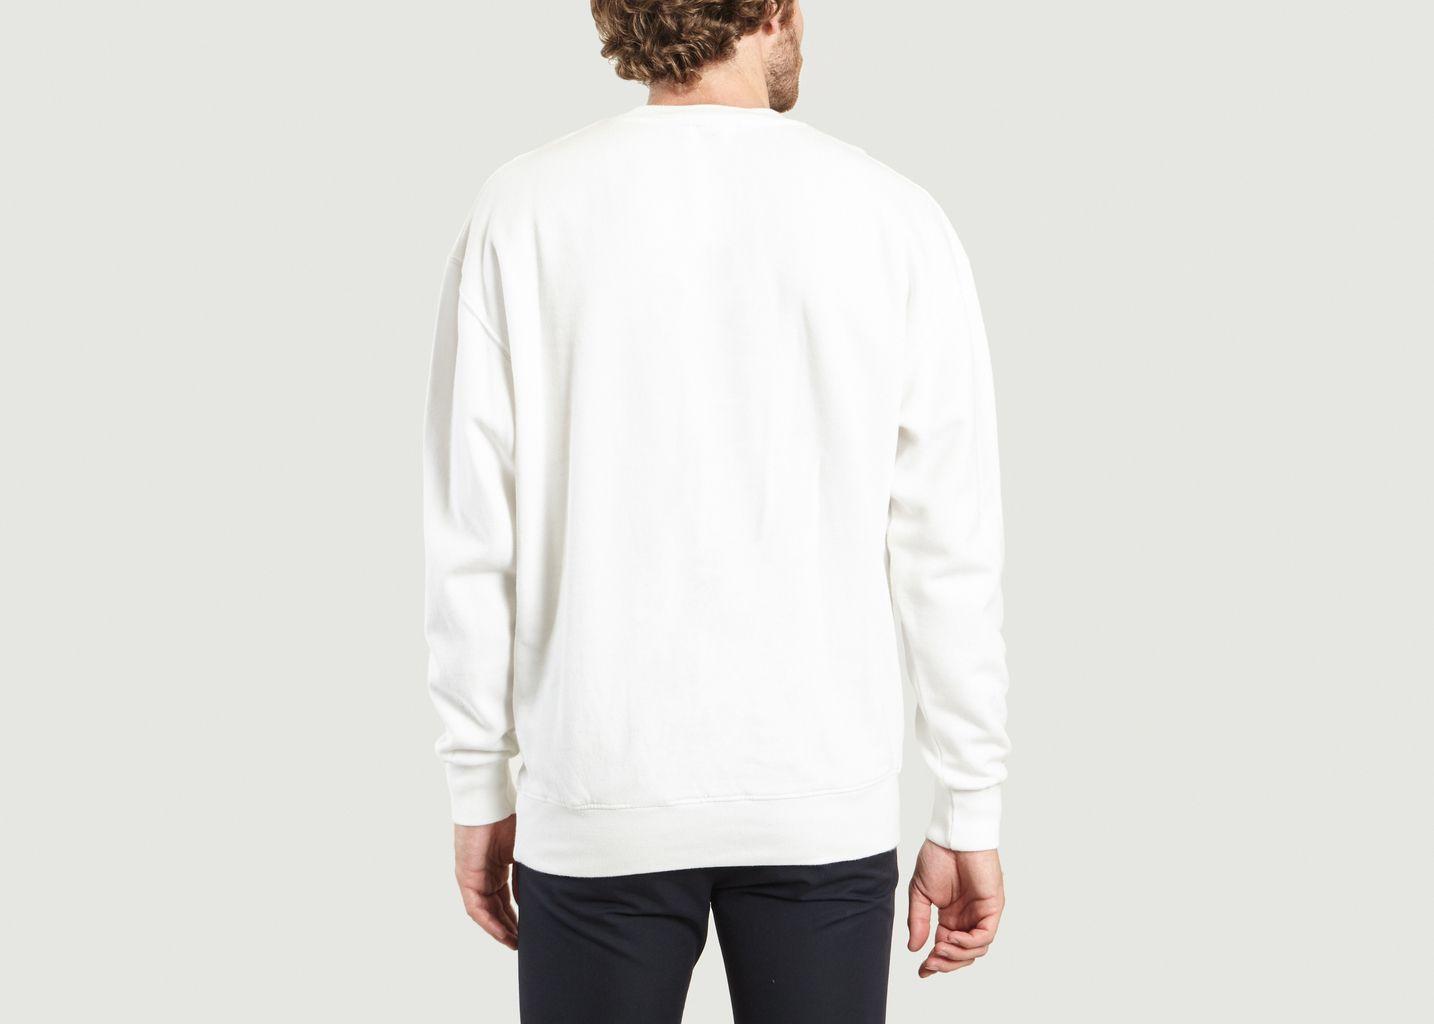 Sweatshirt Code - Maison Kitsuné